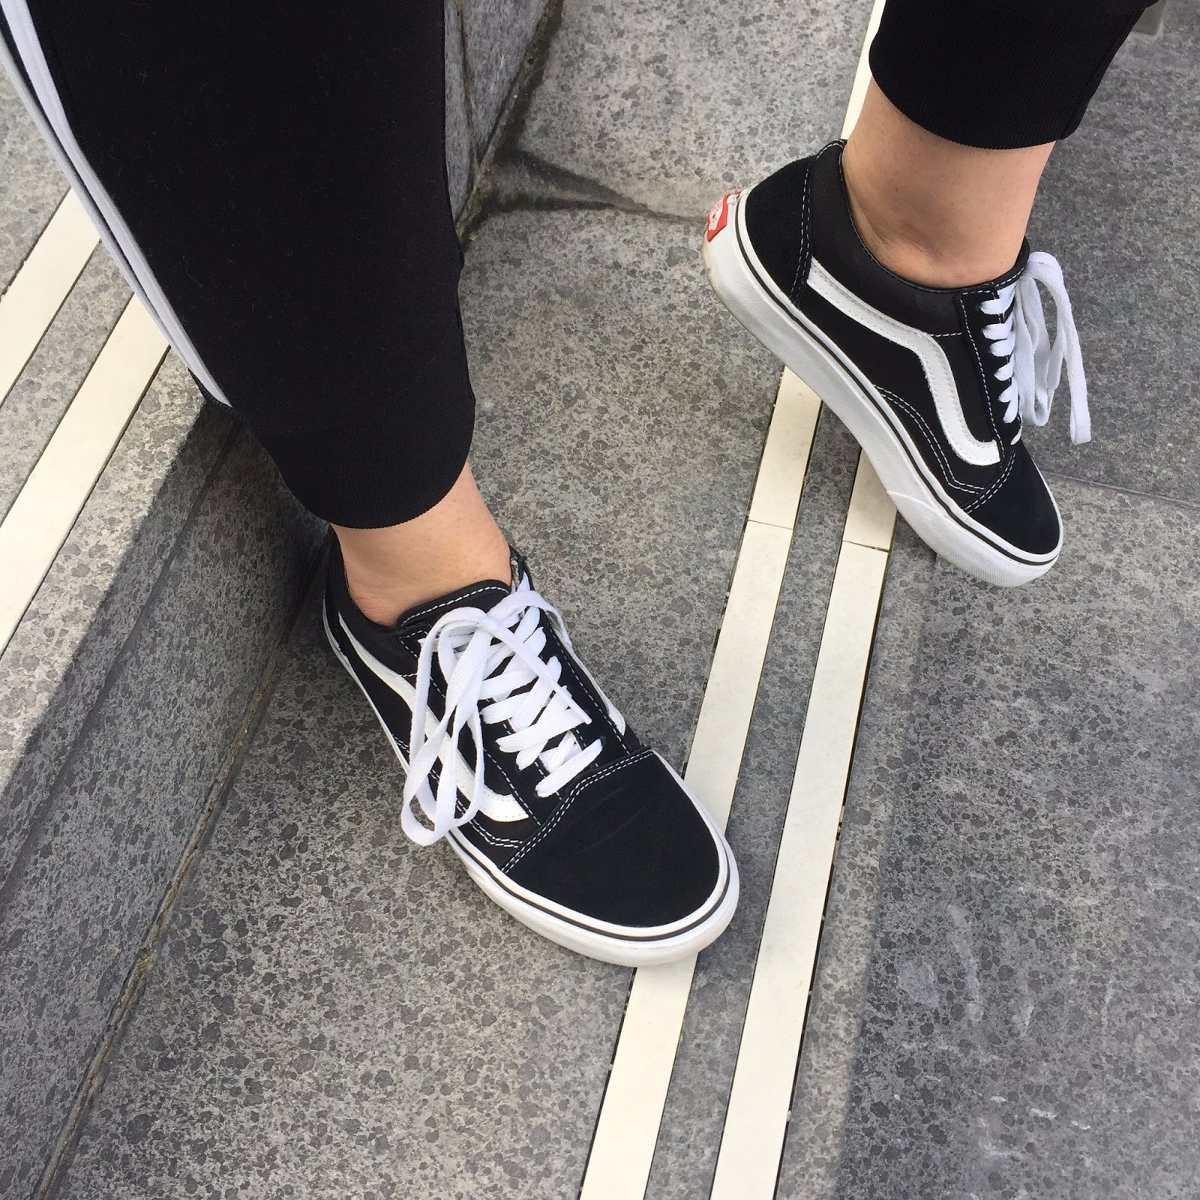 Vans Tienda De Zapatos En Barranquilla dsQCthxBr